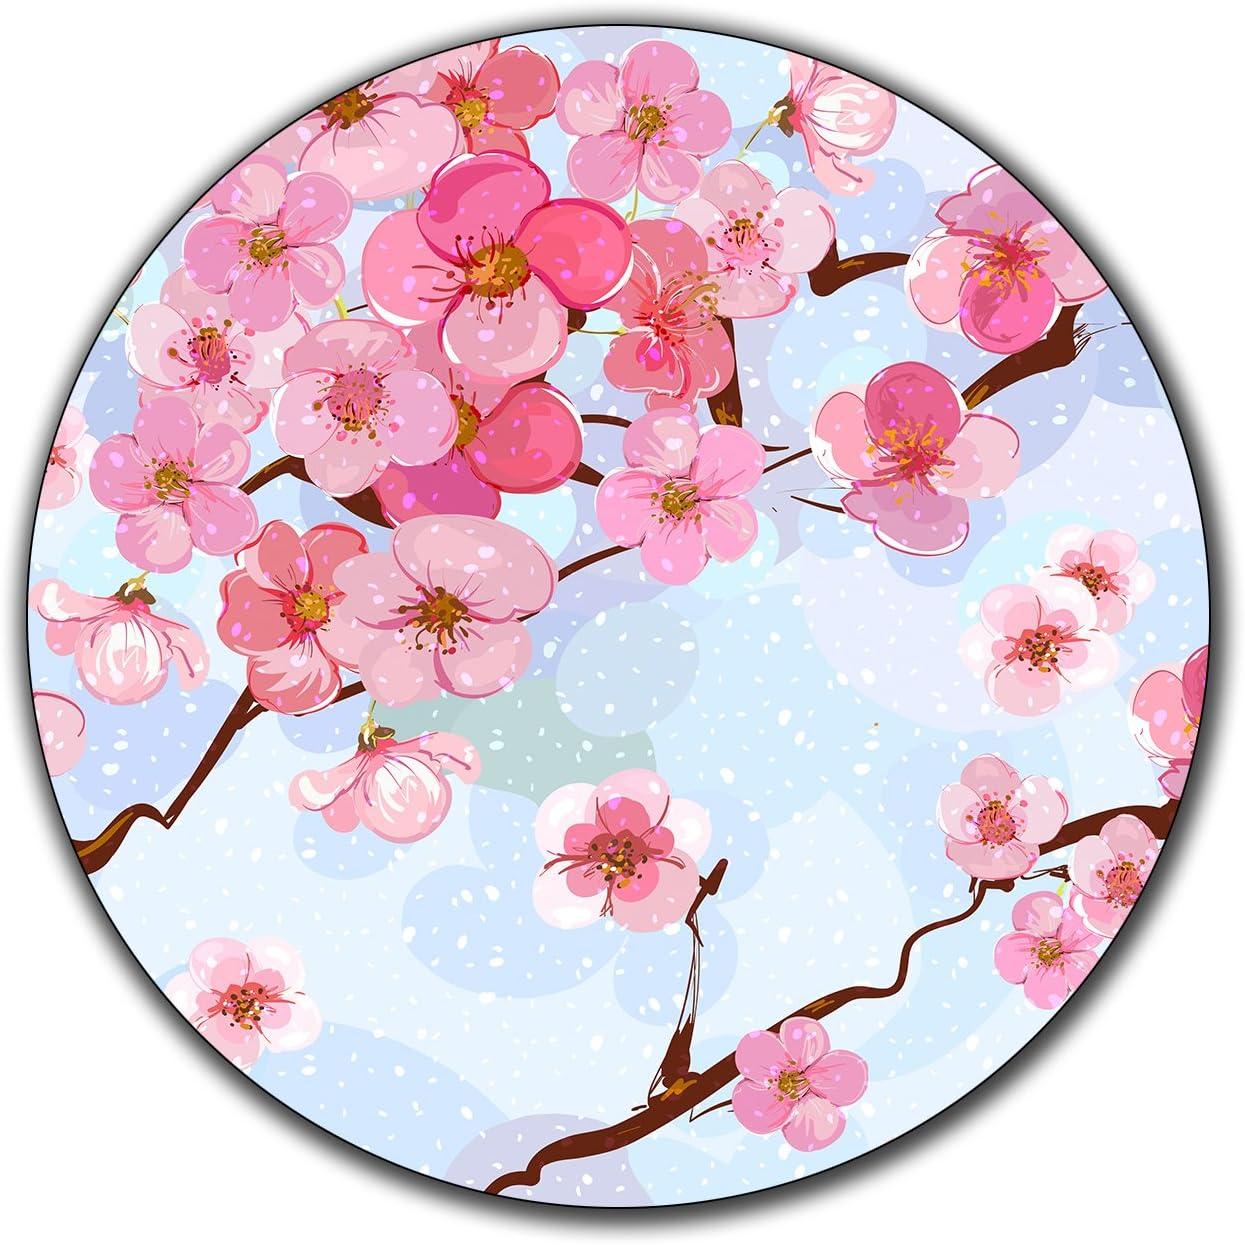 Set off 4-4\u201d Cherry Blossom Glitter Resin Coasters